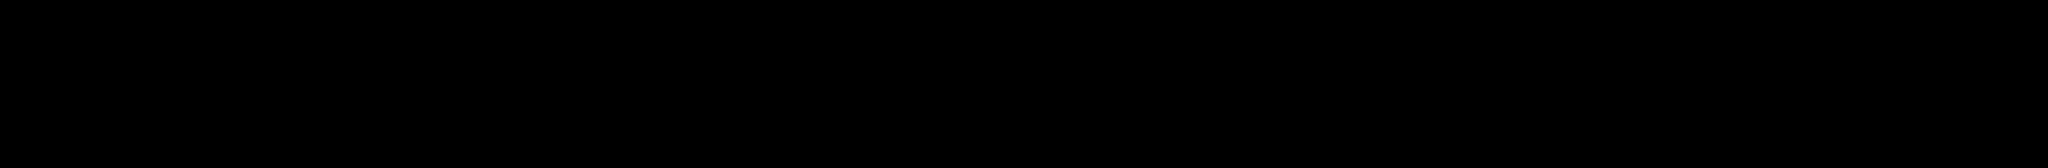 中数LOGO-02